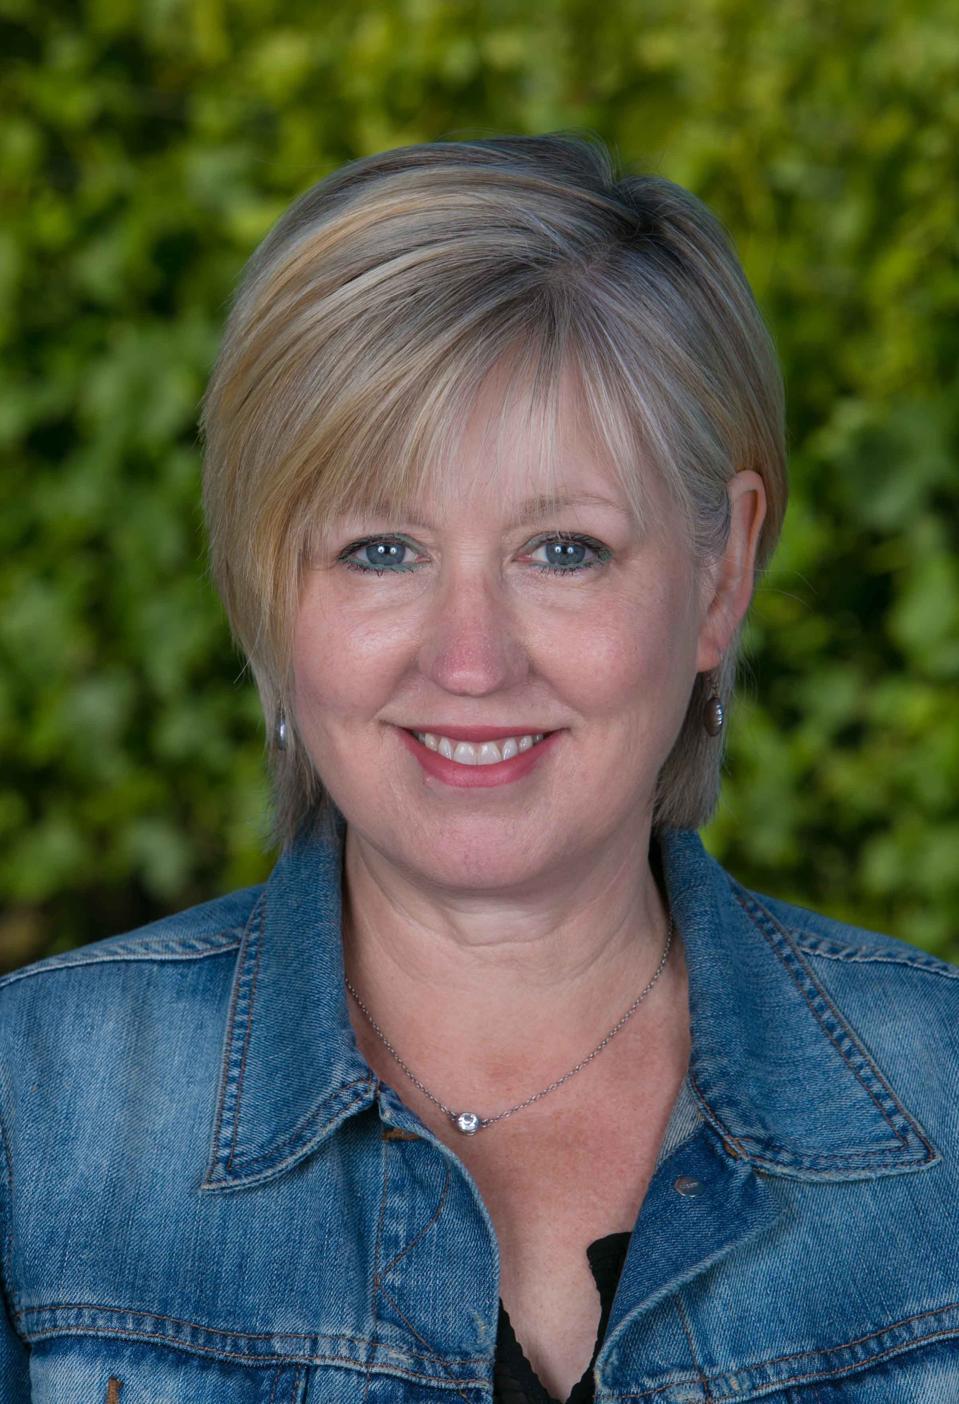 Headshot of Kathleen Inman of Inman Family Wines